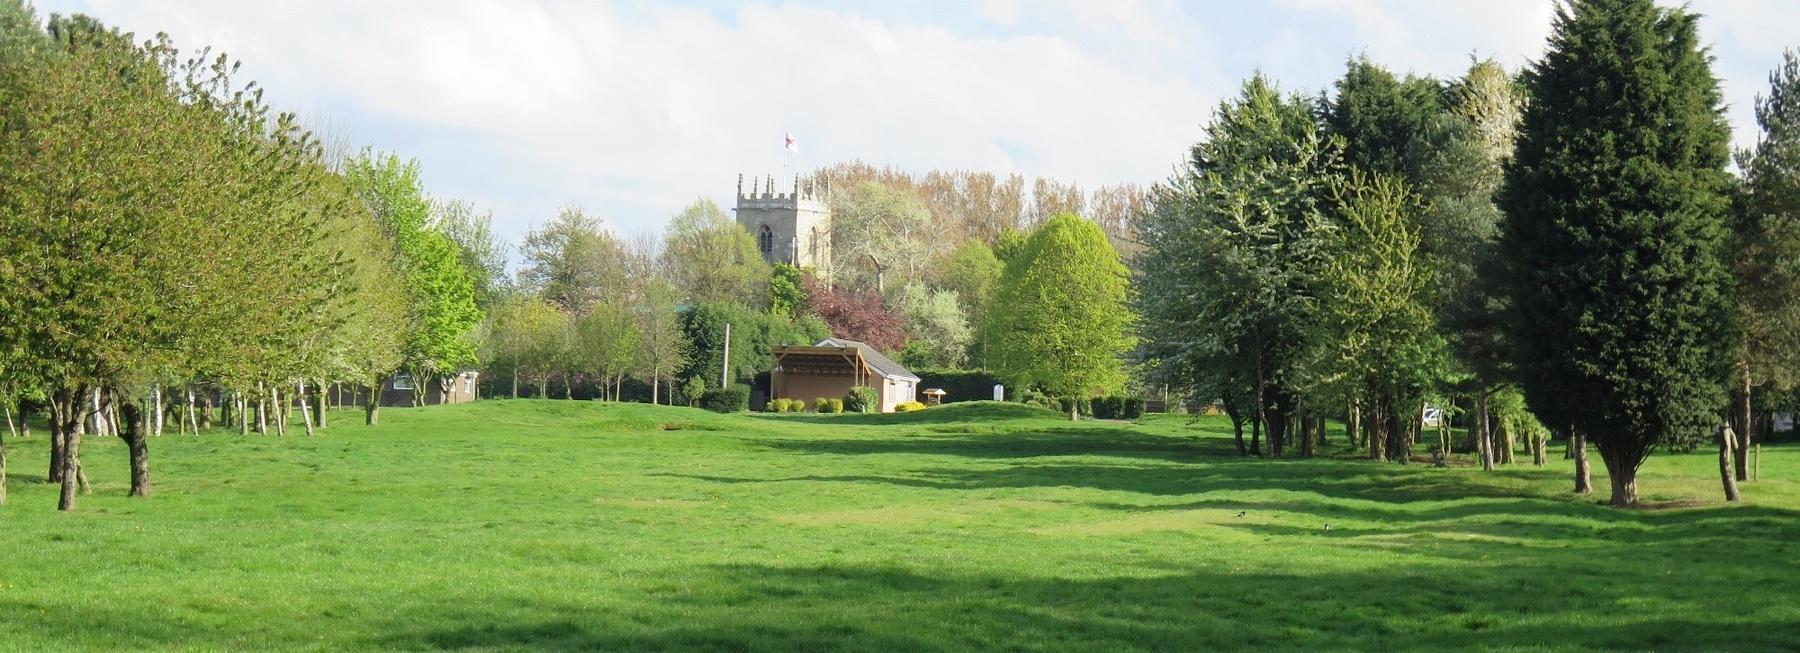 Immingham Golf Club (1)